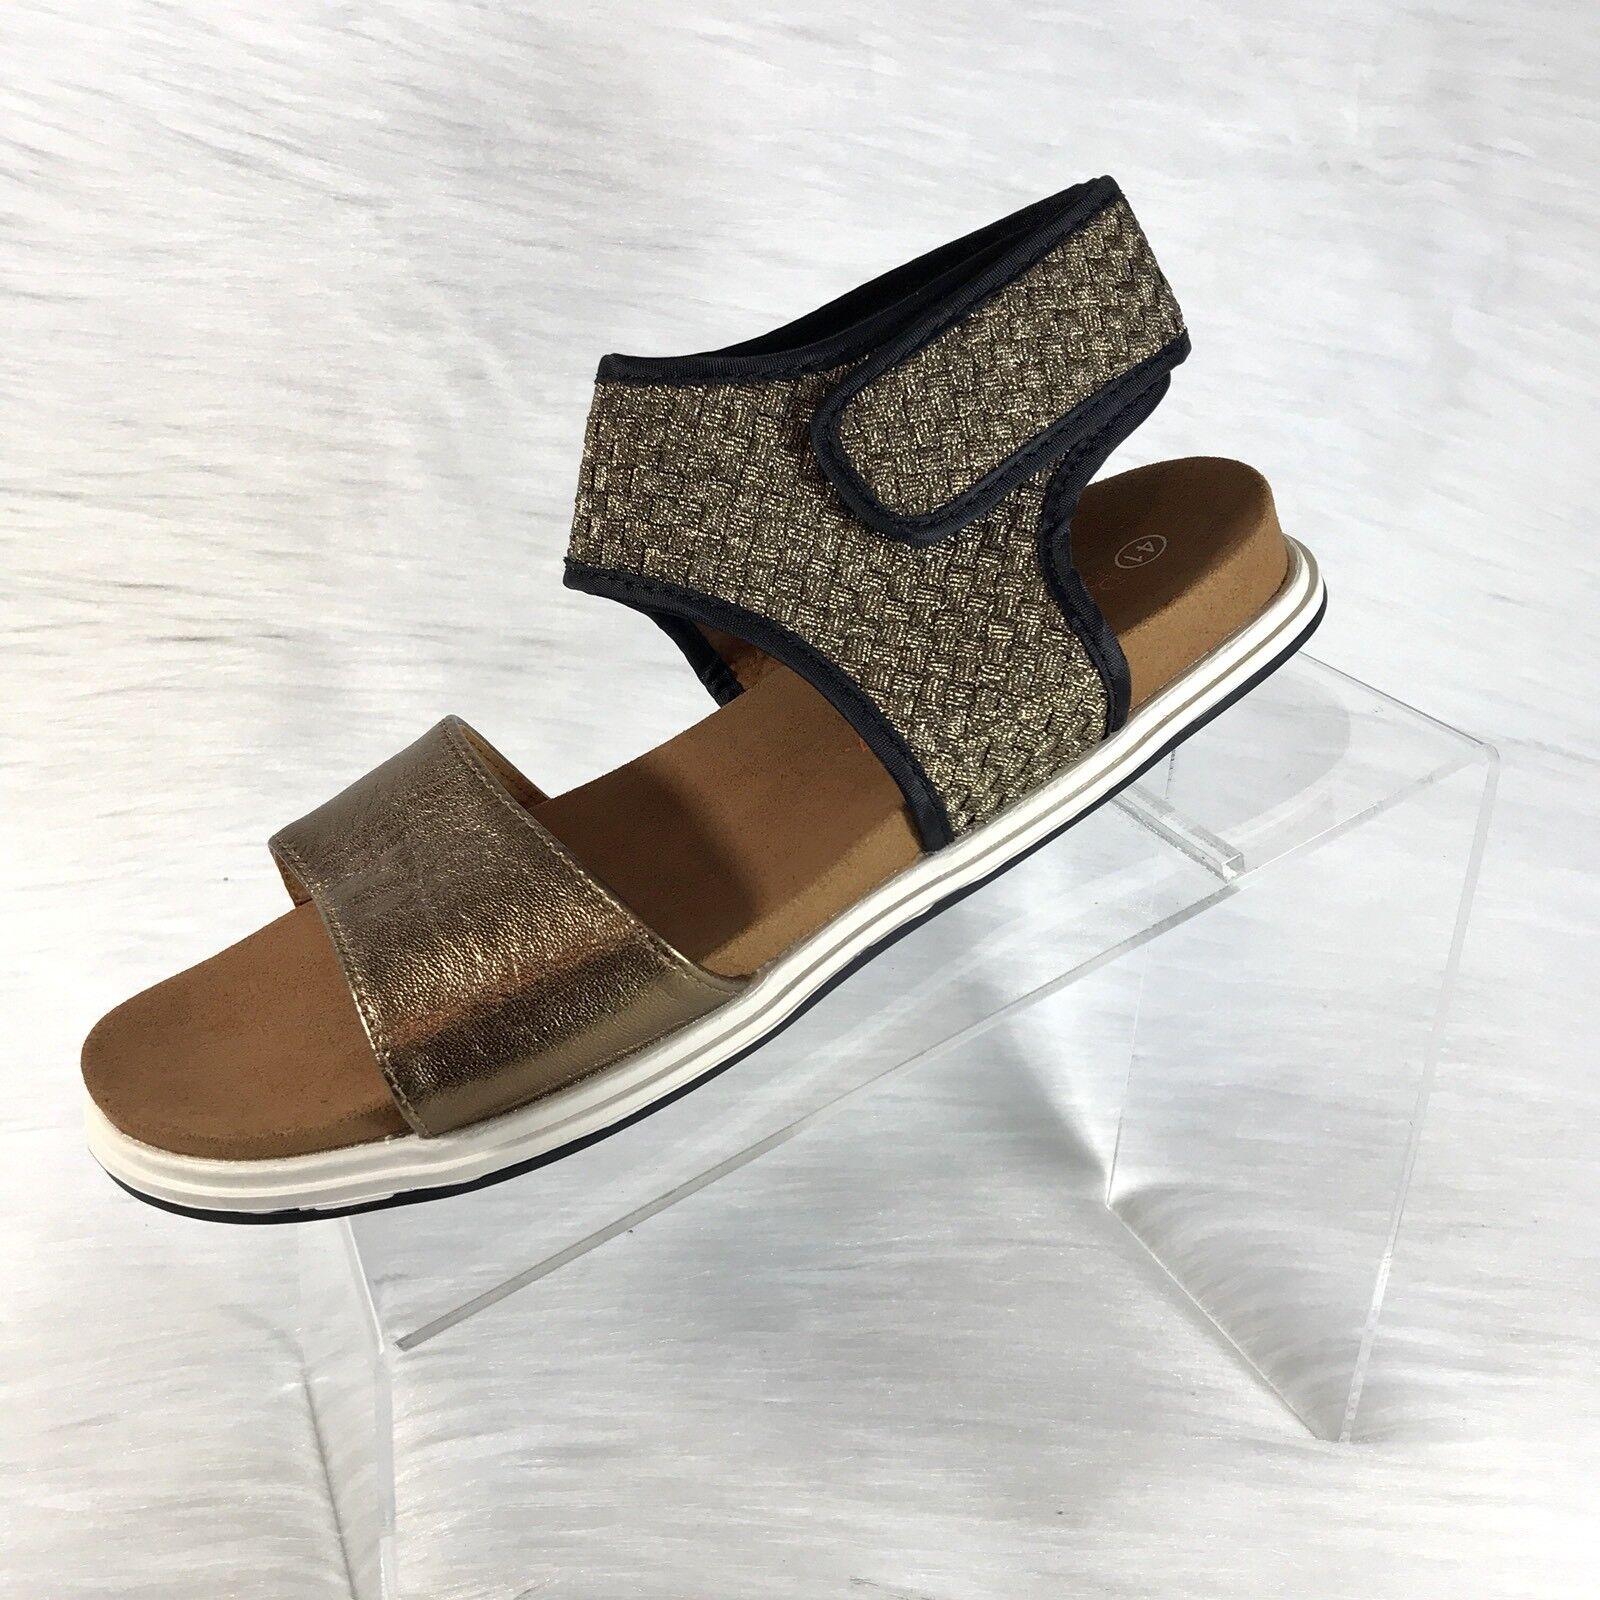 New Bernie Mev Women's Bebe Slingback Sandals Bronze Weaved Size 41 US 10.5